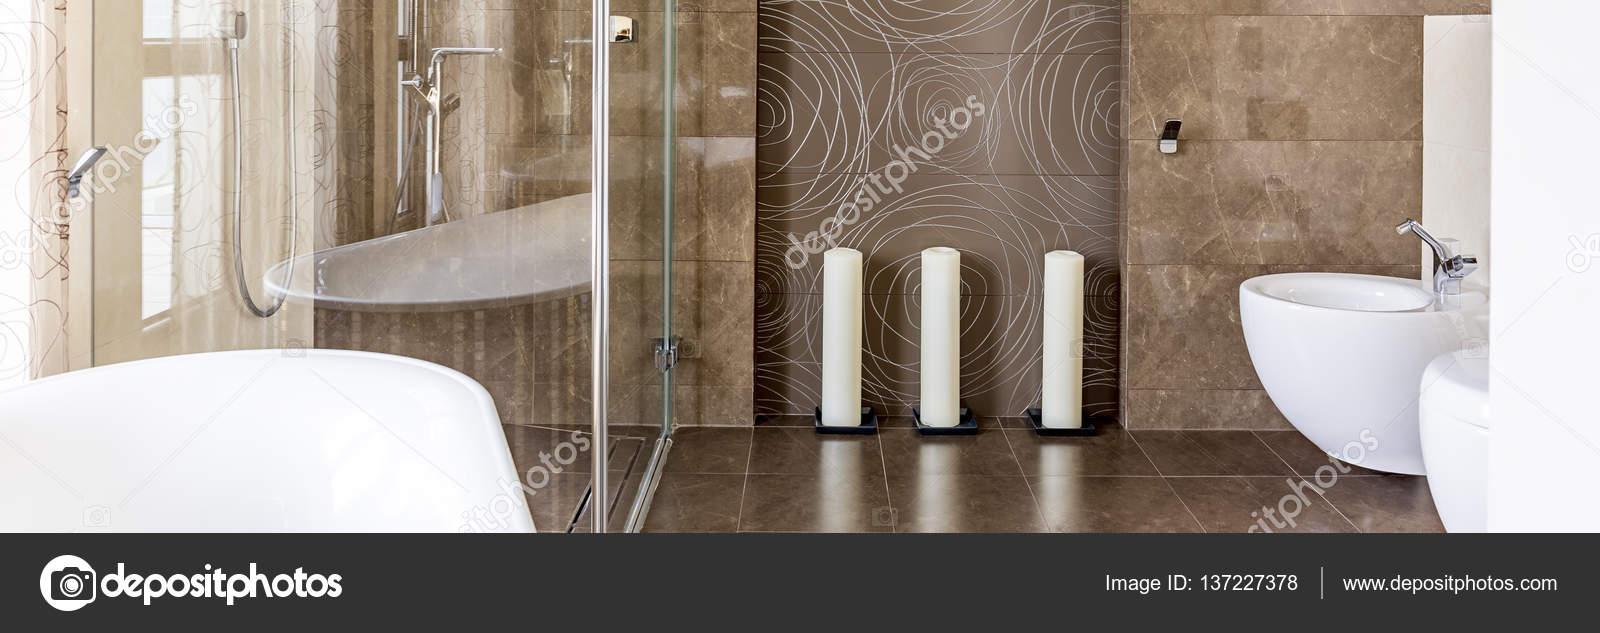 Badezimmer mit begehbarer Dusche — Stockfoto © photographee ...